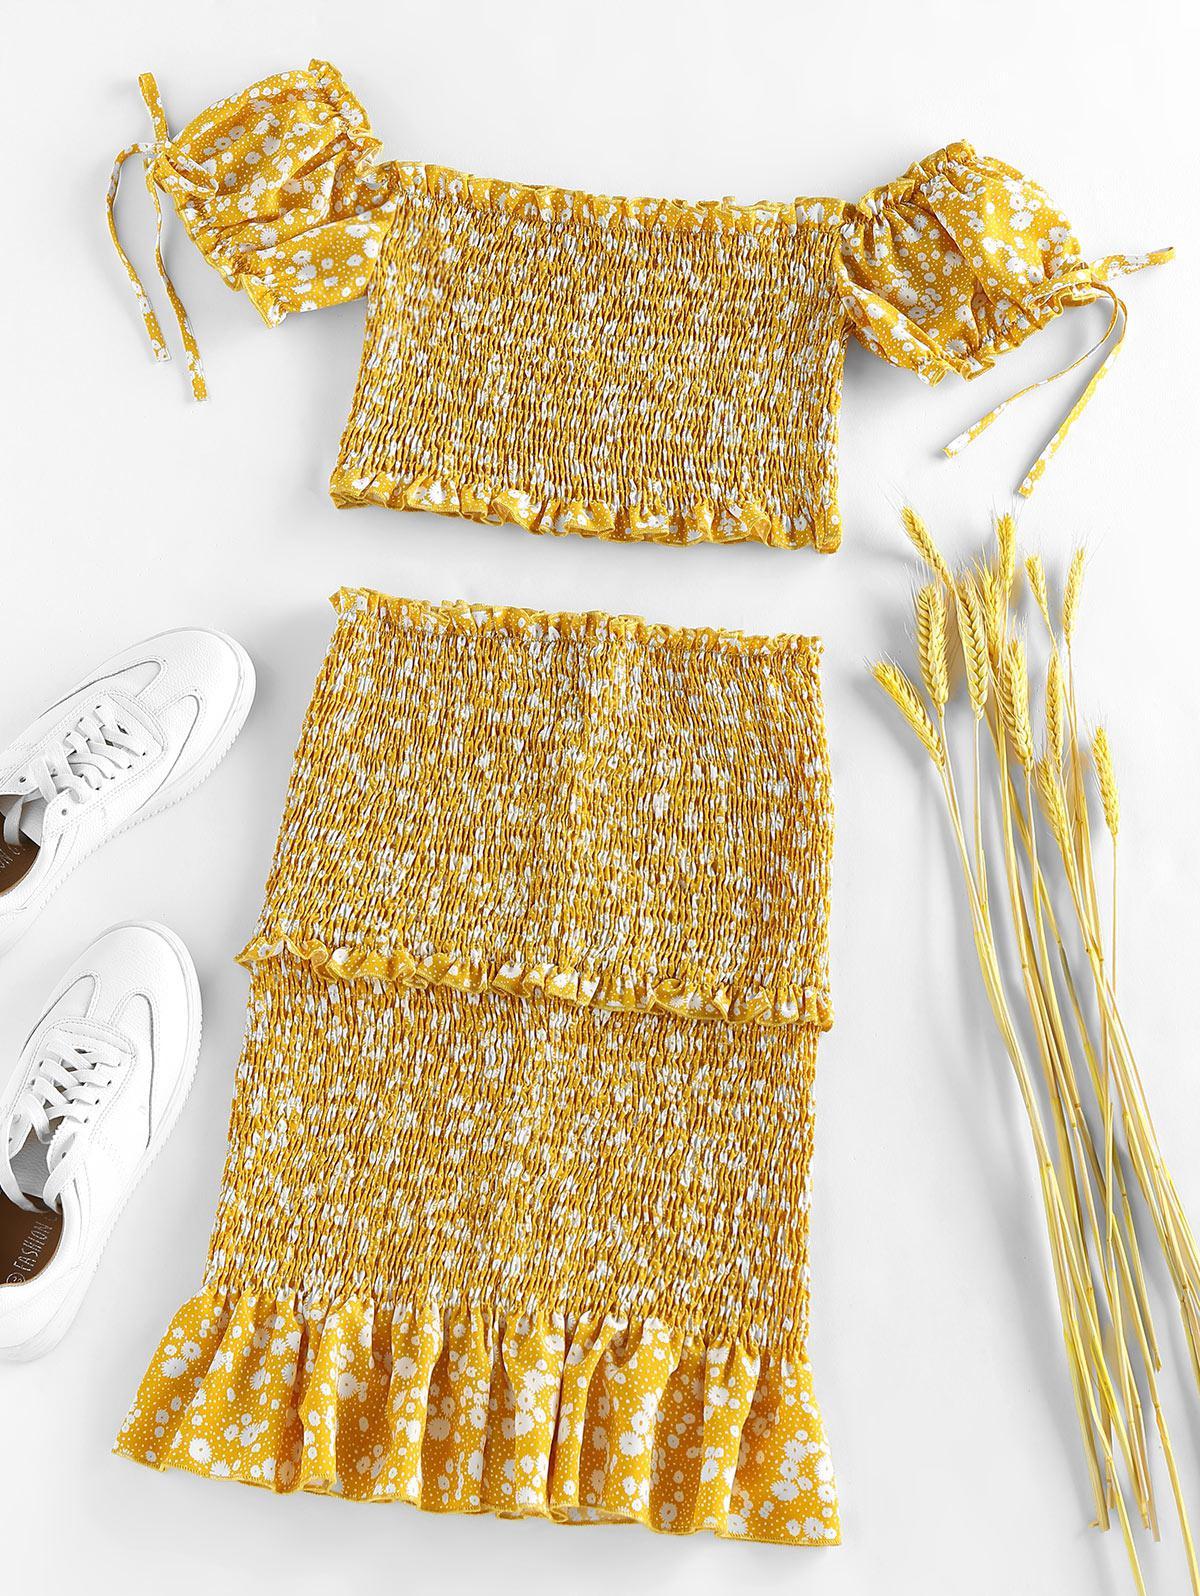 ZAFUL Ditsy Print Smocked Ruffle Puff Sleeve Mermaid Skirt Set